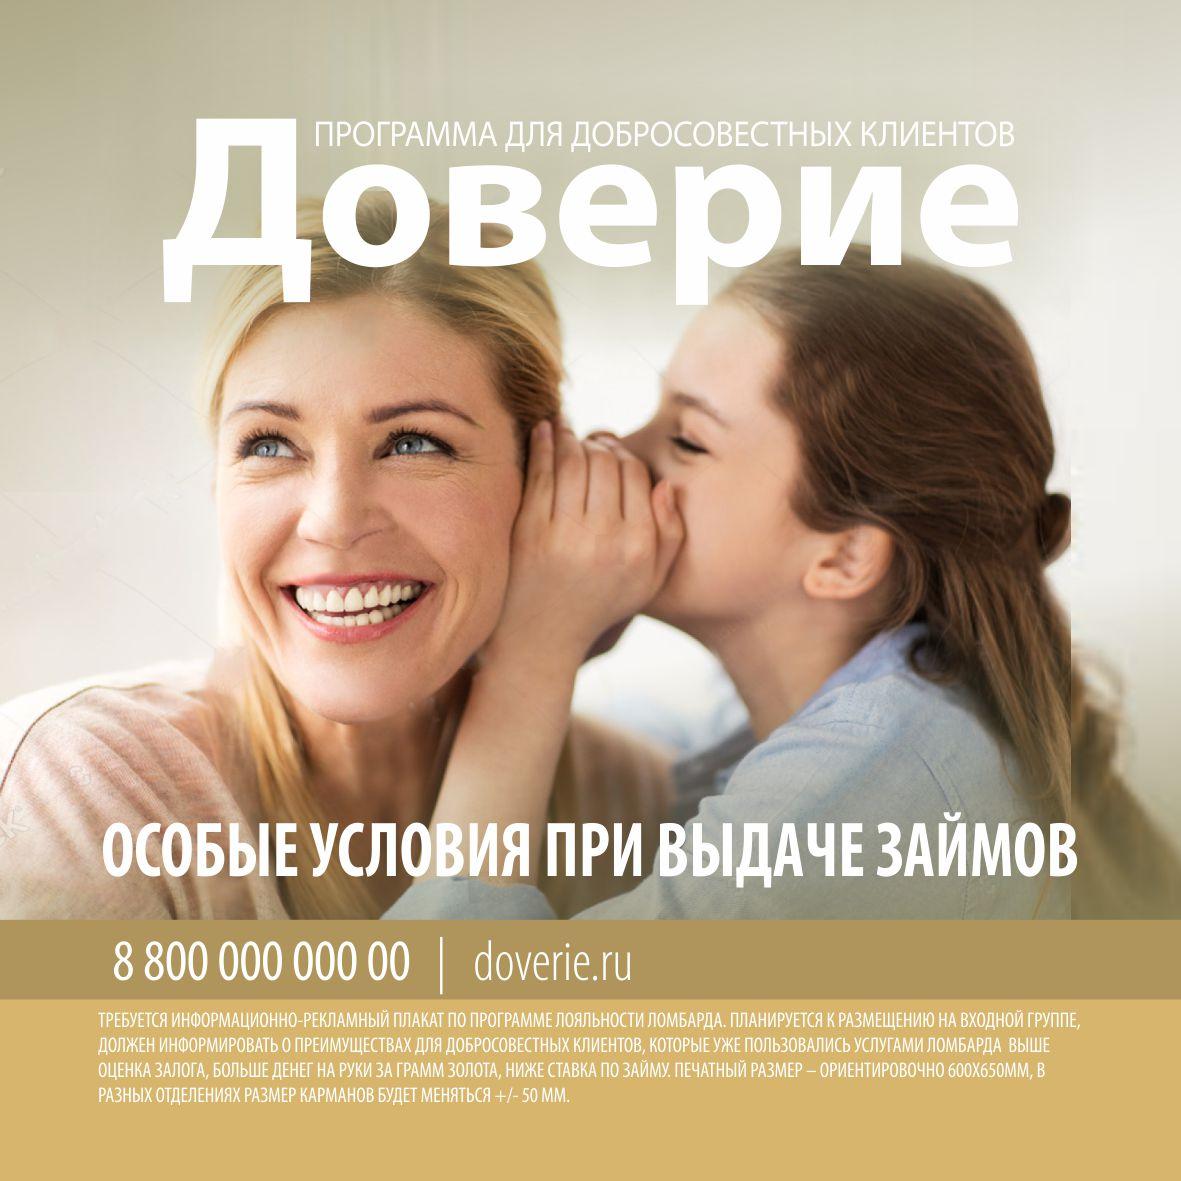 Дизайн плаката по программе лояльности ломбарда фото f_7655c621a3882939.jpg